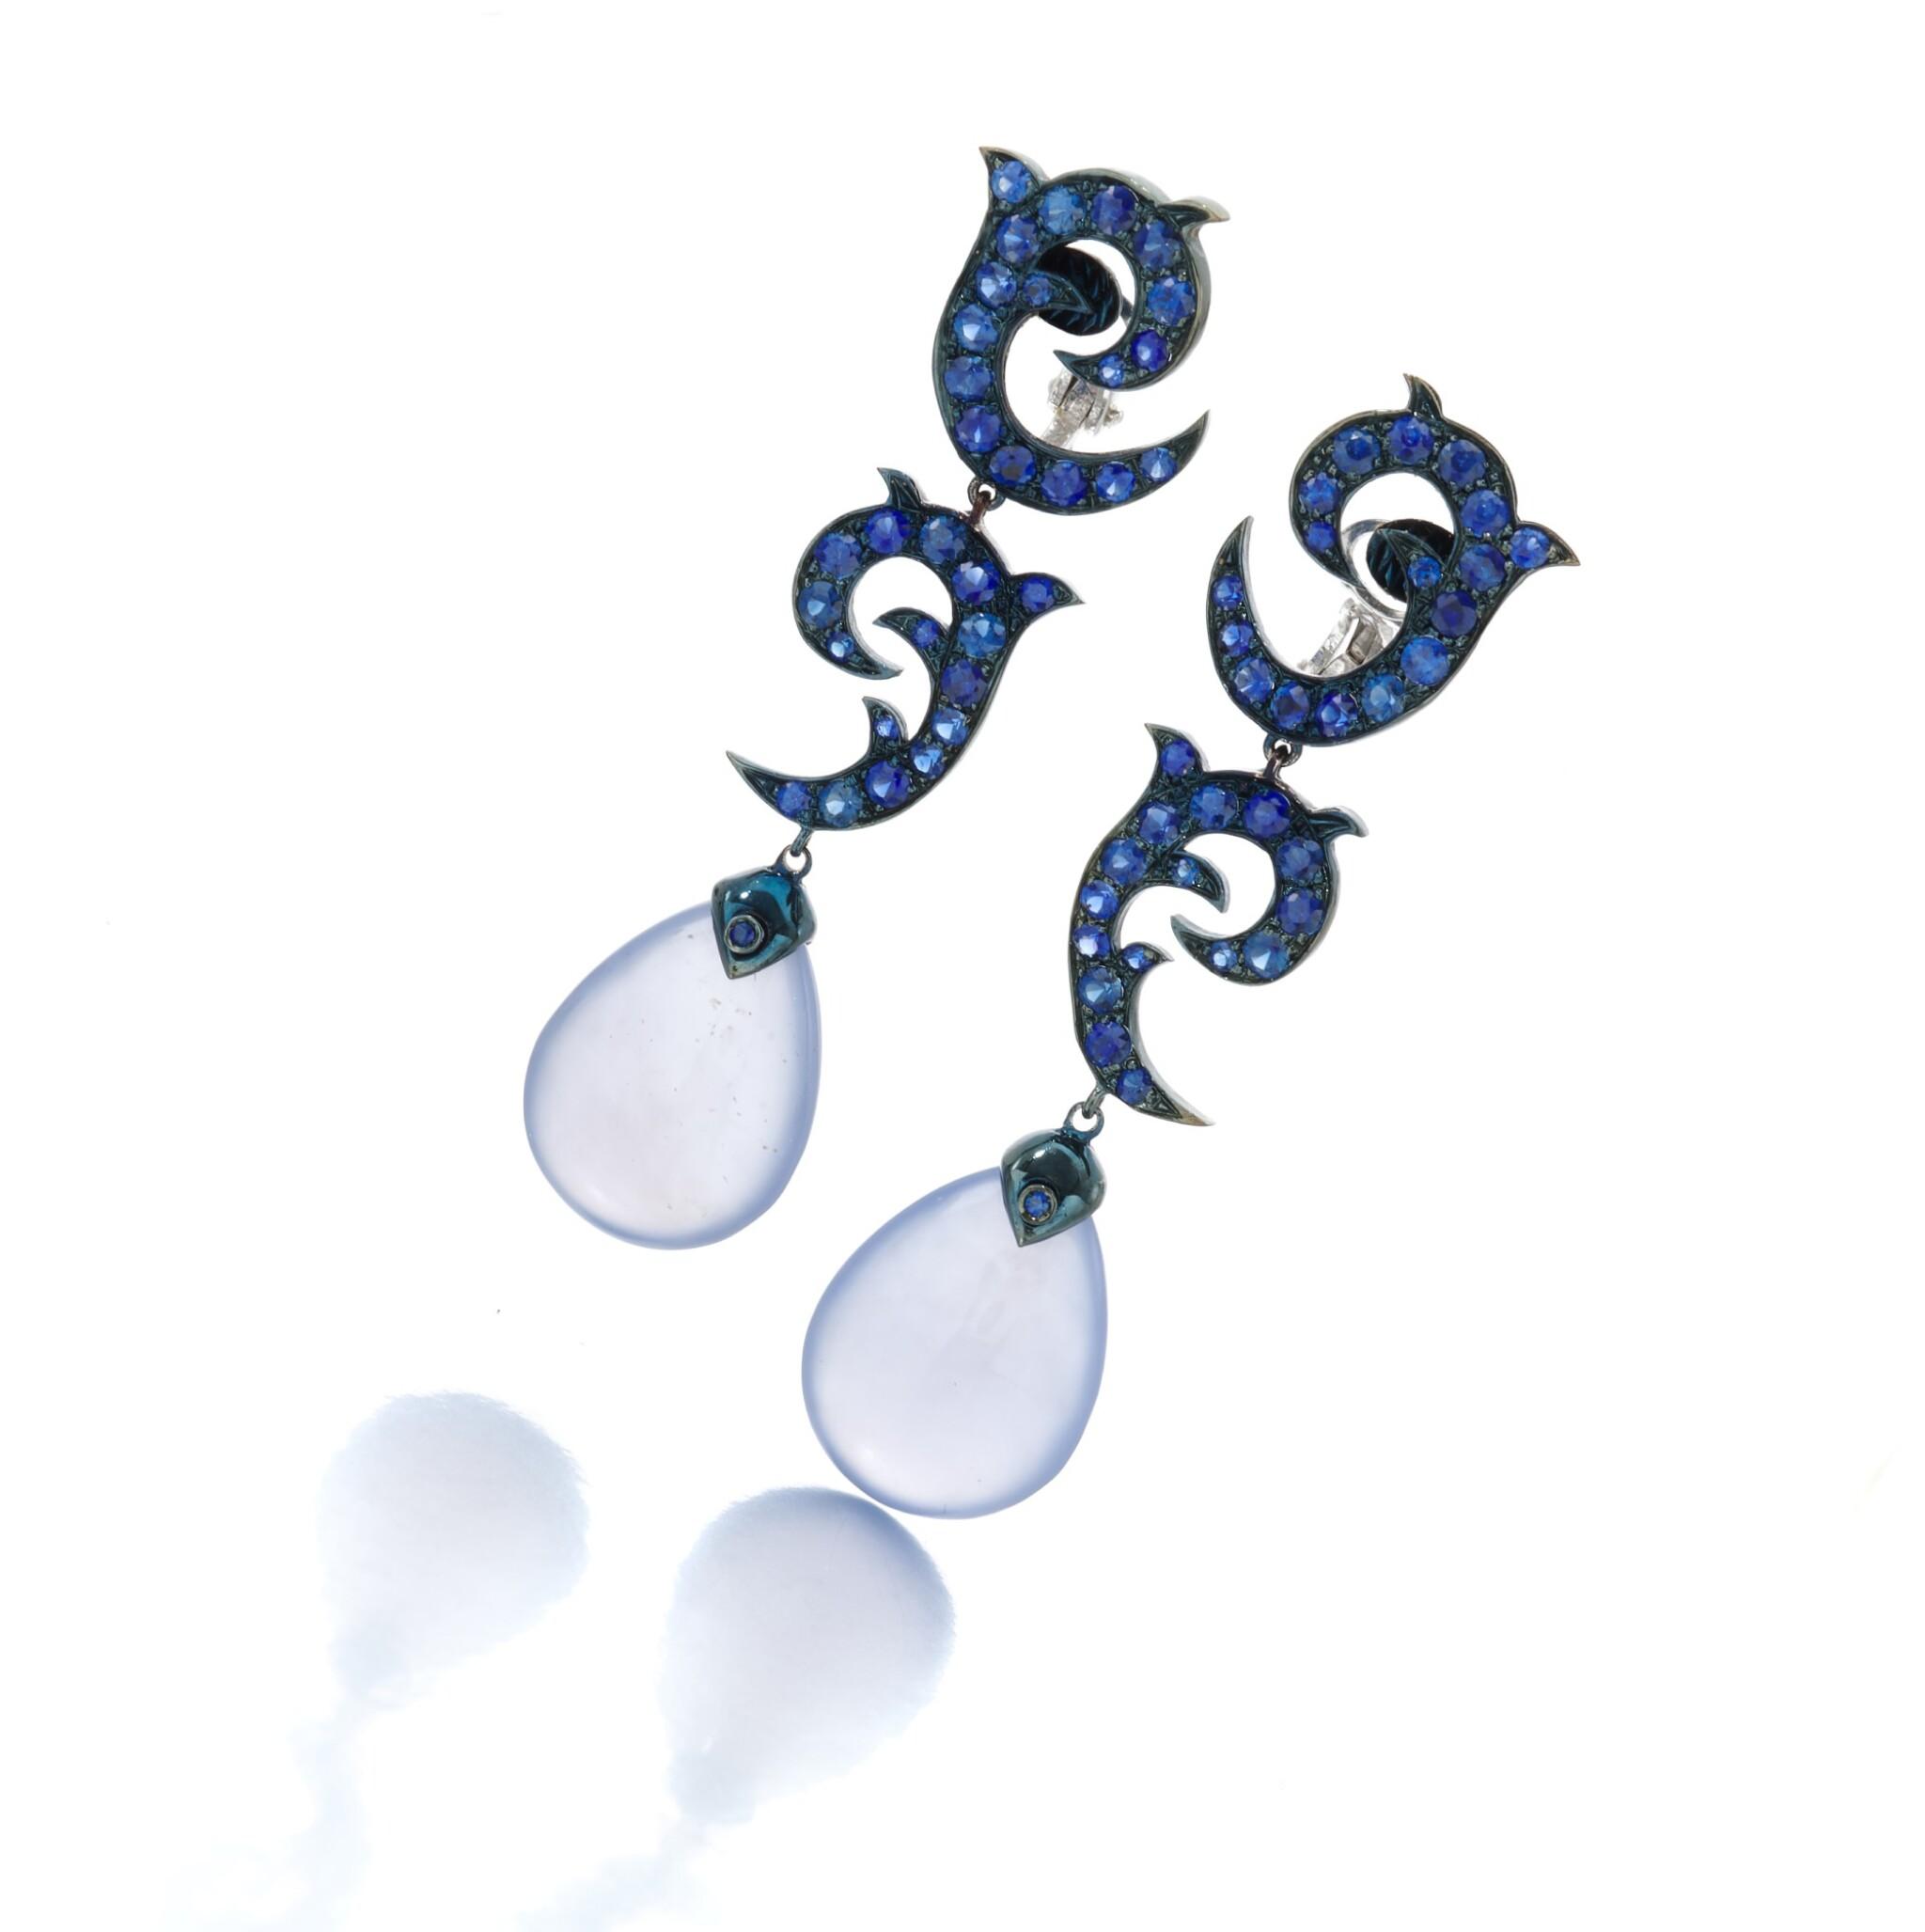 View 1 of Lot 138. Pair of sapphire and chalcedony earrings (Paio di orecchini in zaffiri e calcedonio).